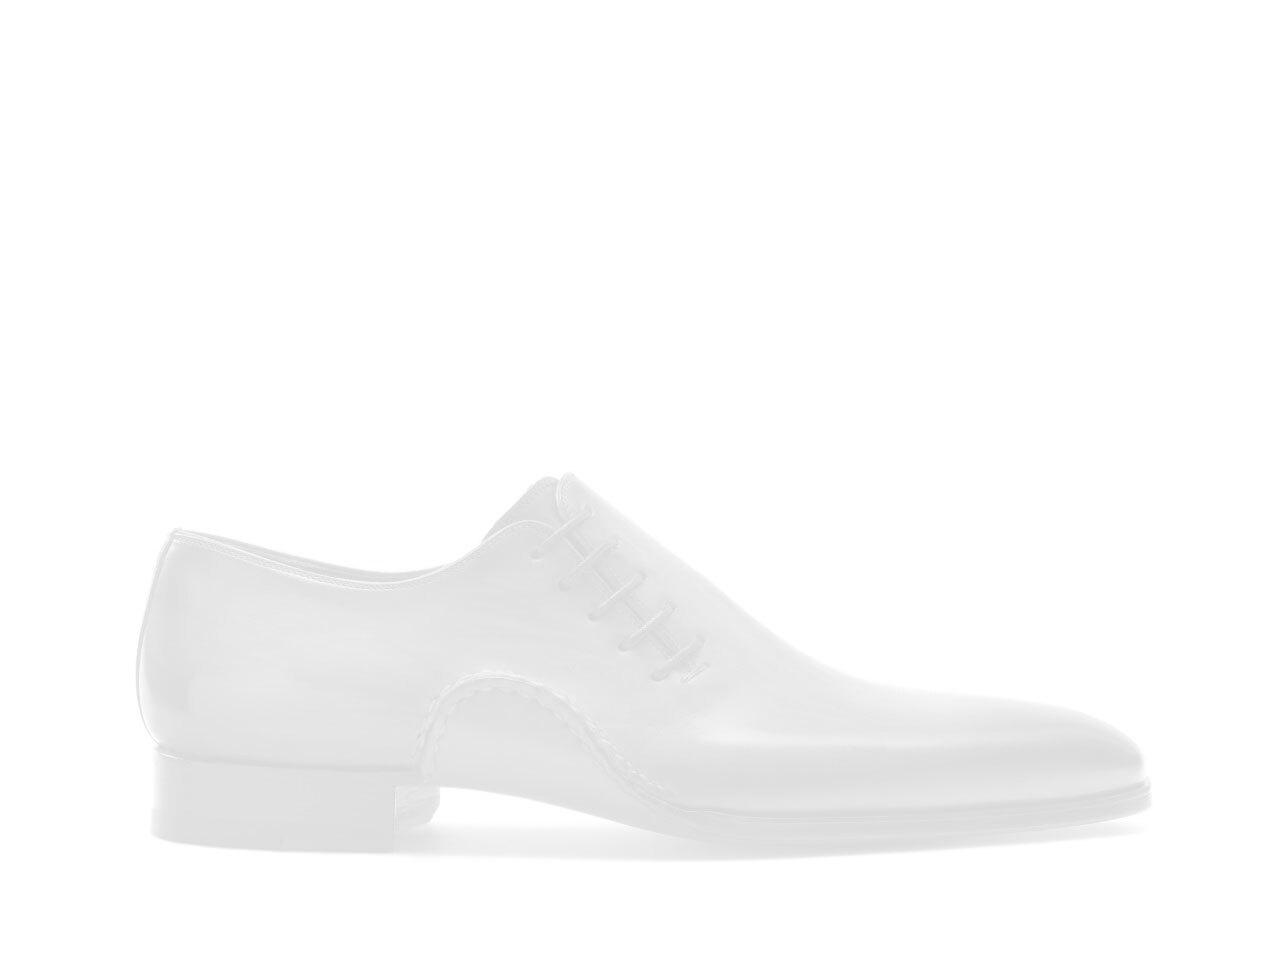 Cuero light brown loafer shoes for men - Magnanni